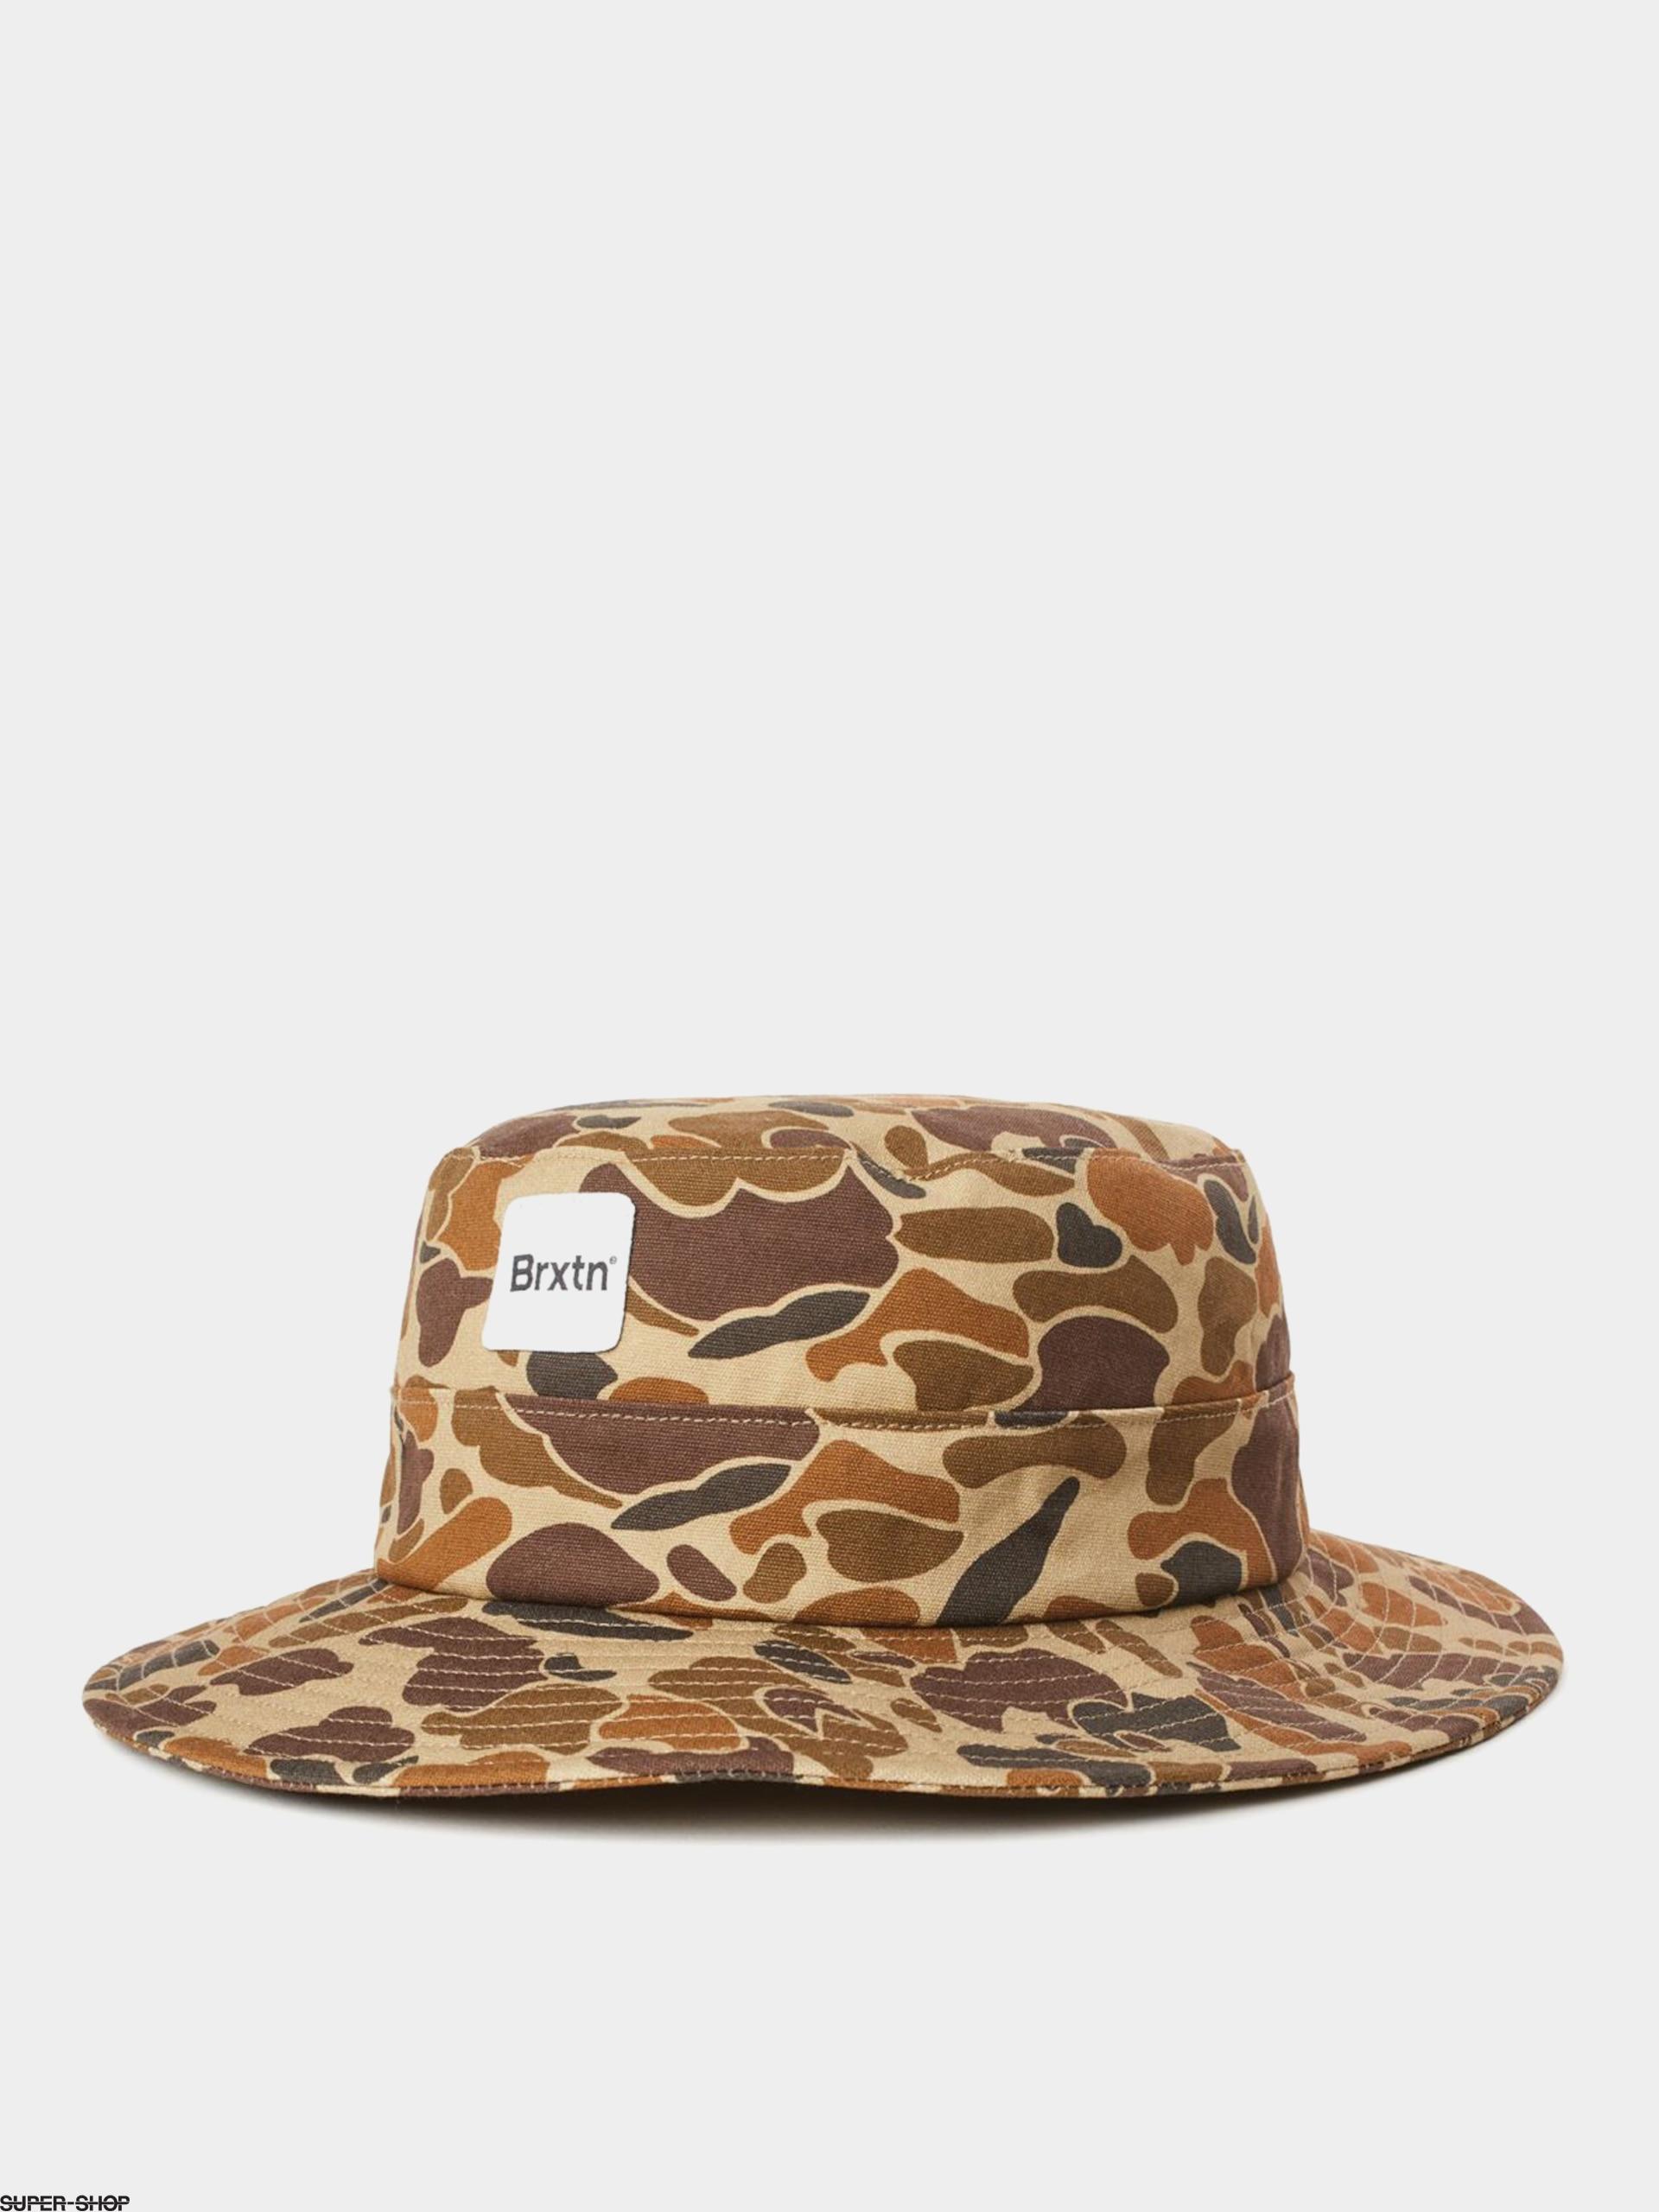 Brixton Gate Duck Camo Bucket Hat